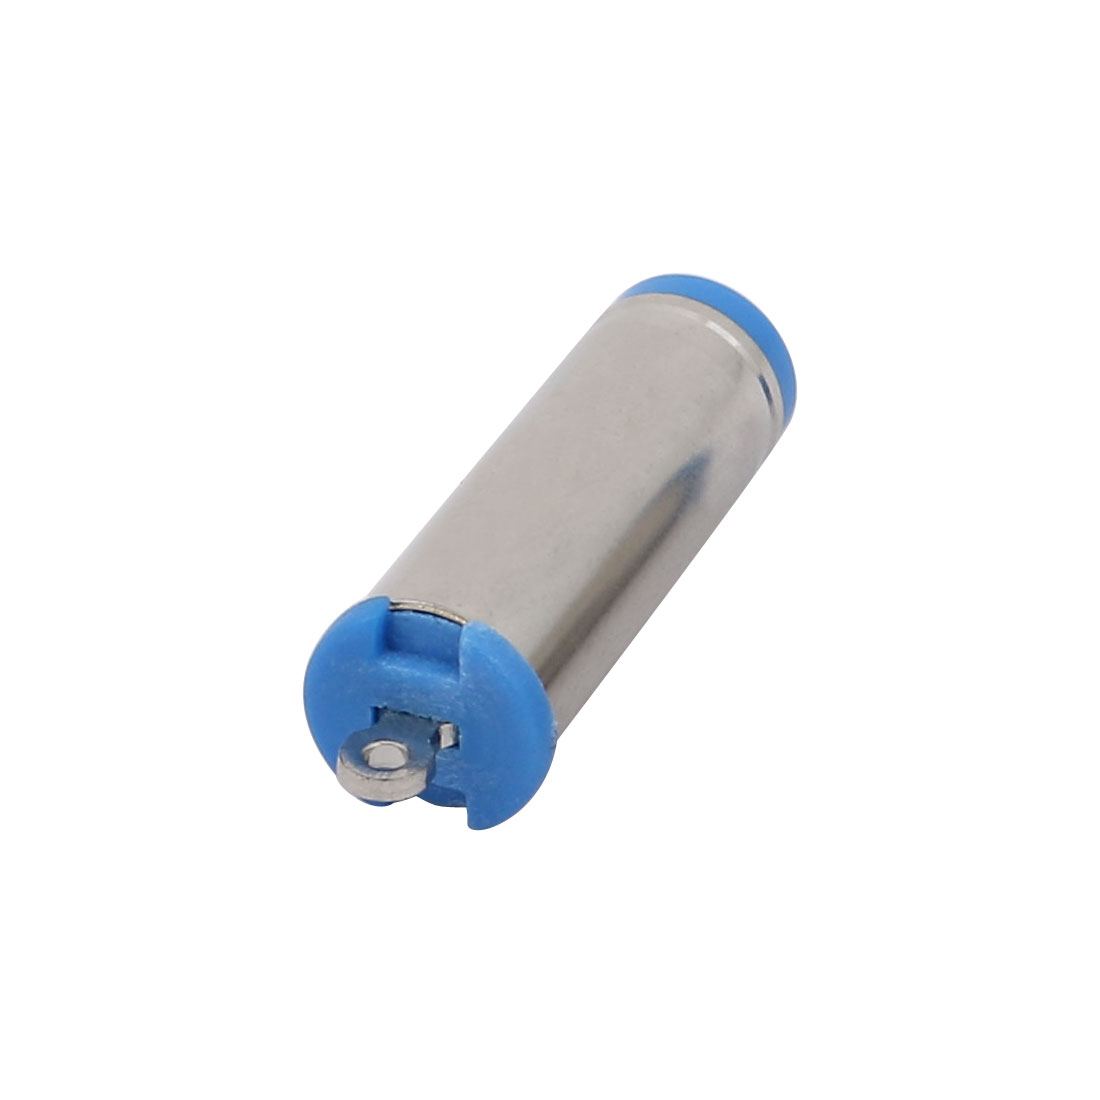 Unique Bargains 5pcs 6330tv230bl 63mmx30mm Dc Power Jack Adapter Wiring Solder Male Barrel Connector